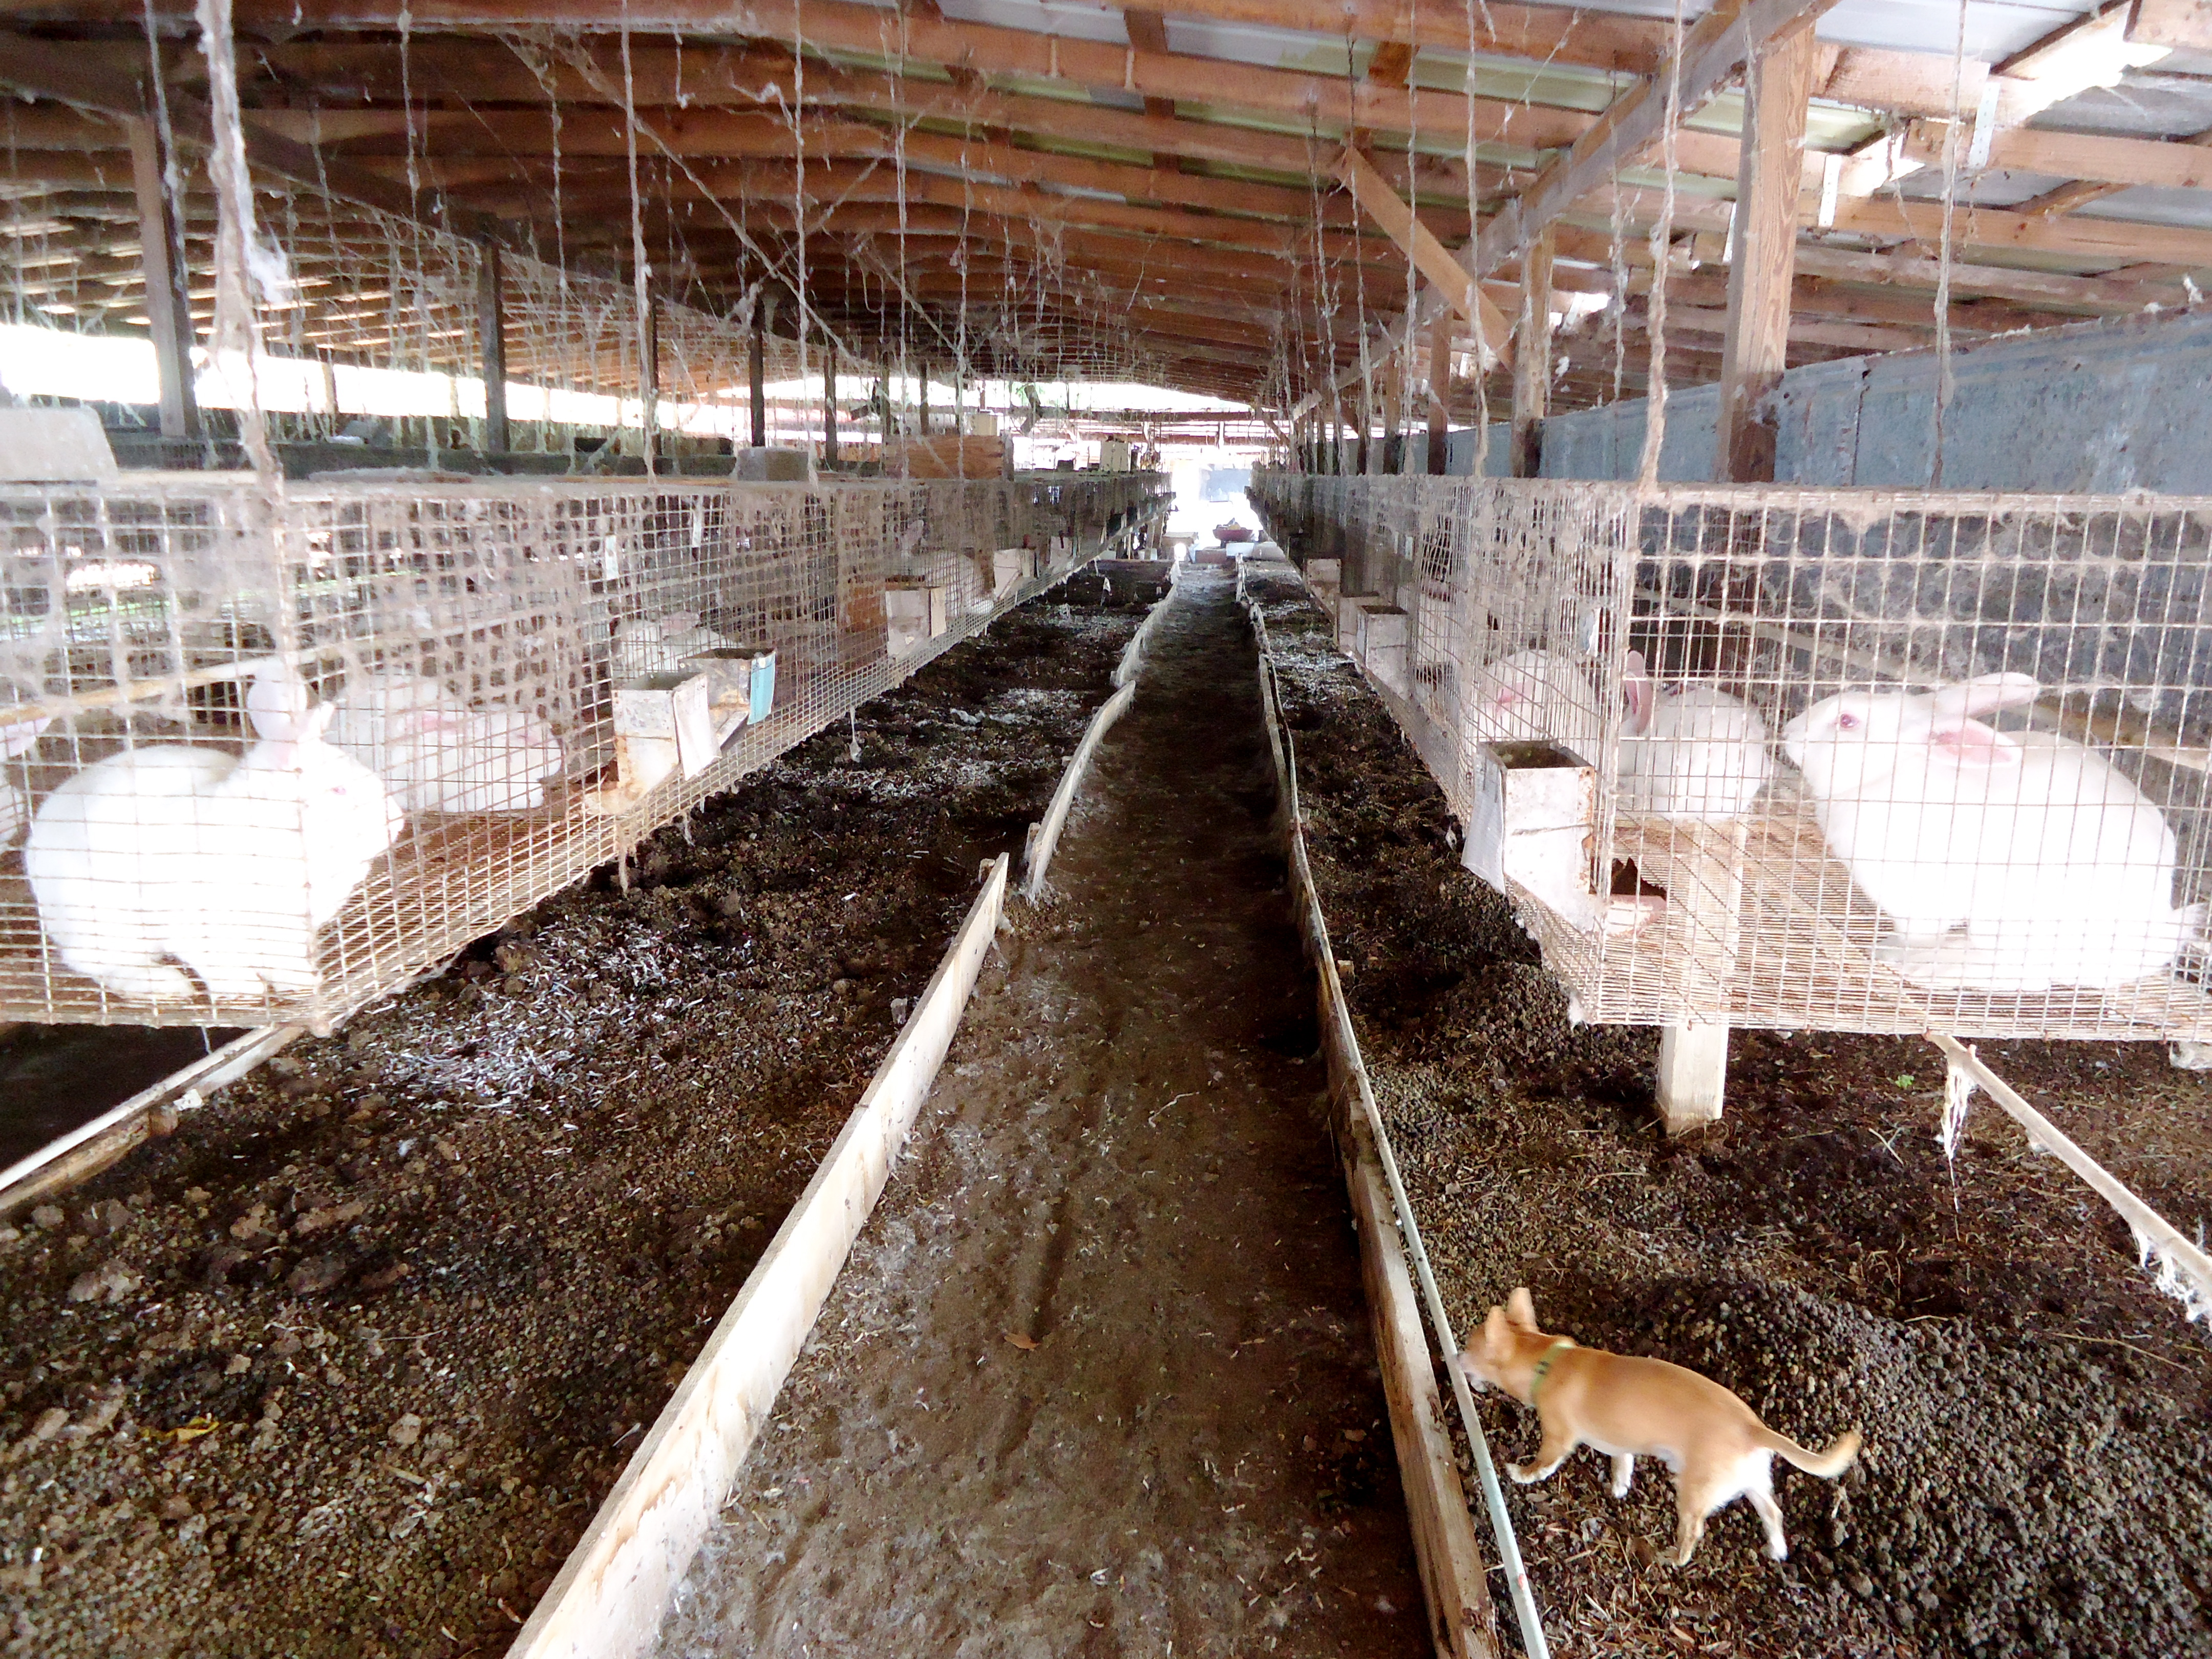 how to start a rabbit farming business in nigeria udeozochibuzo blog